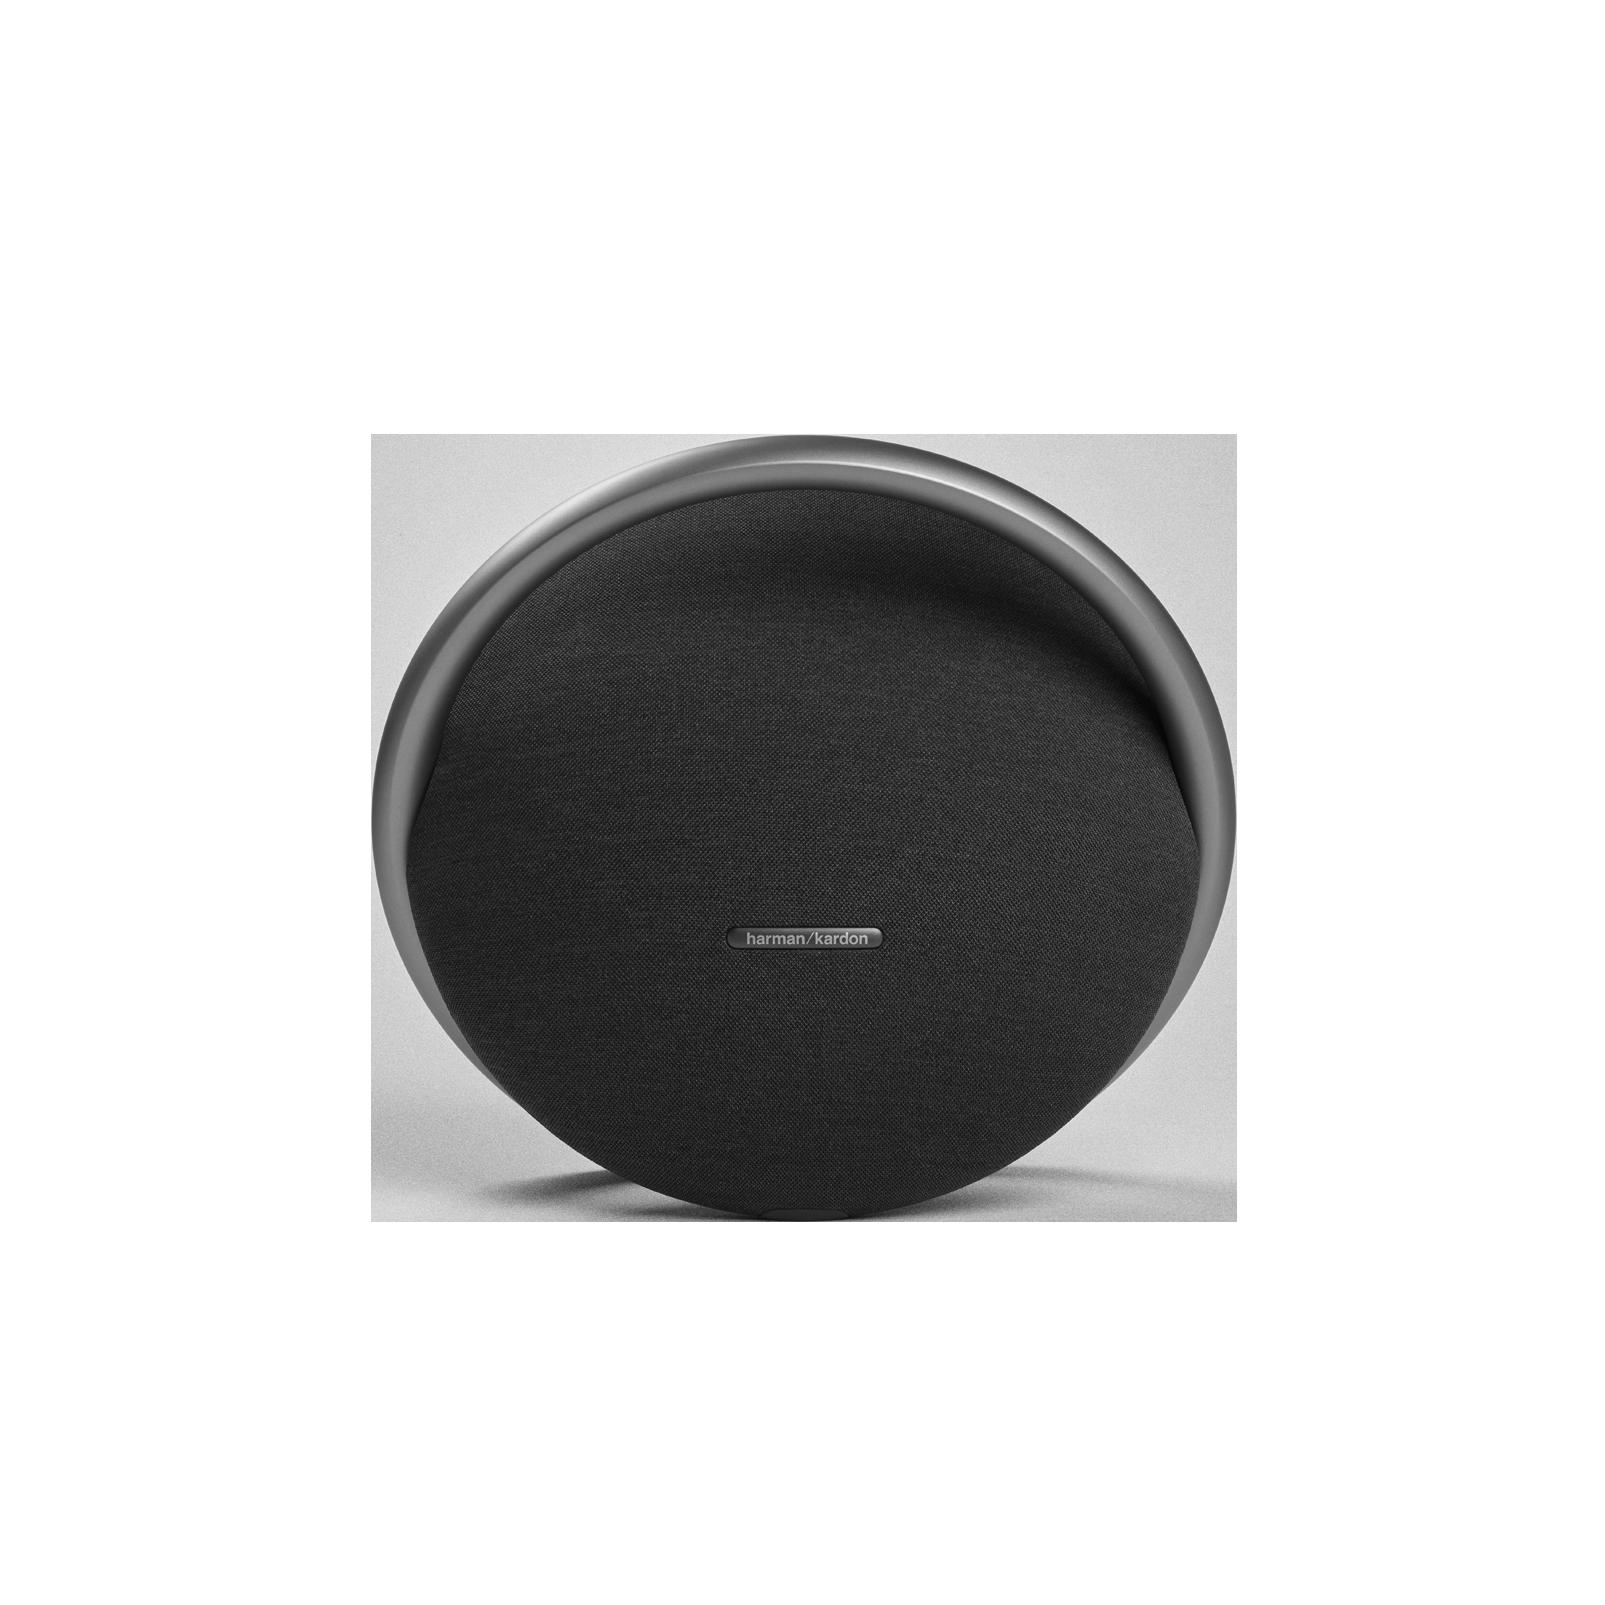 Onyx Studio 7 - Black - Portable Stereo Bluetooth Speaker - Front